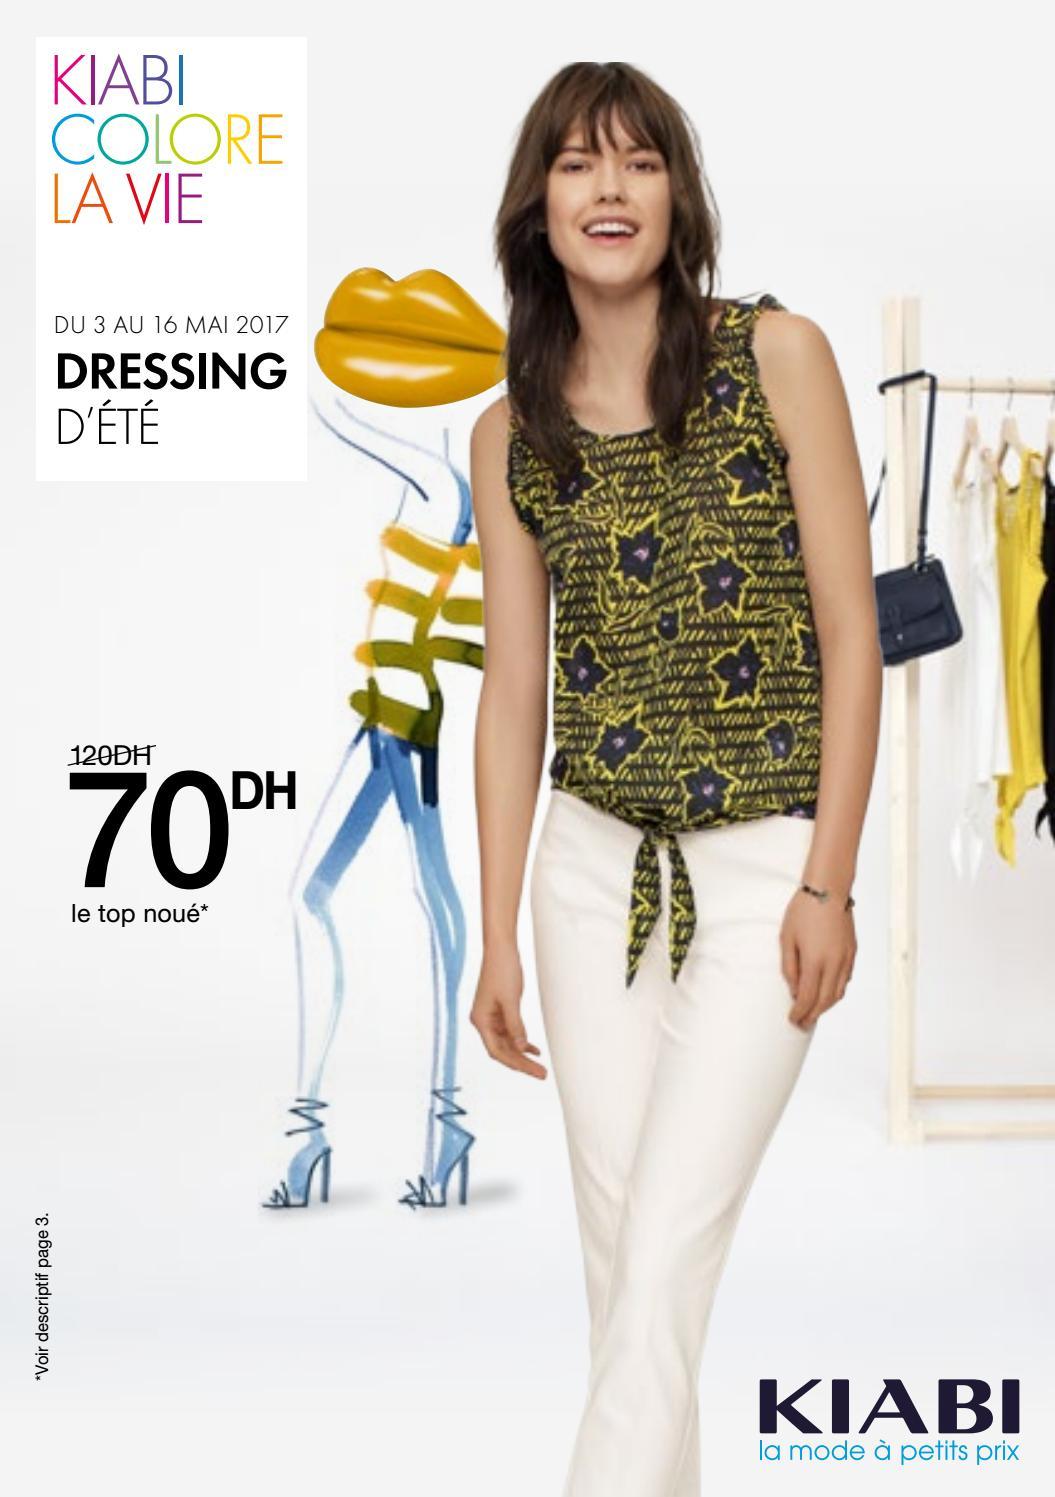 ed40b7a334cbe Kiabi Maroc Catalogue 2017 | Mrsolde